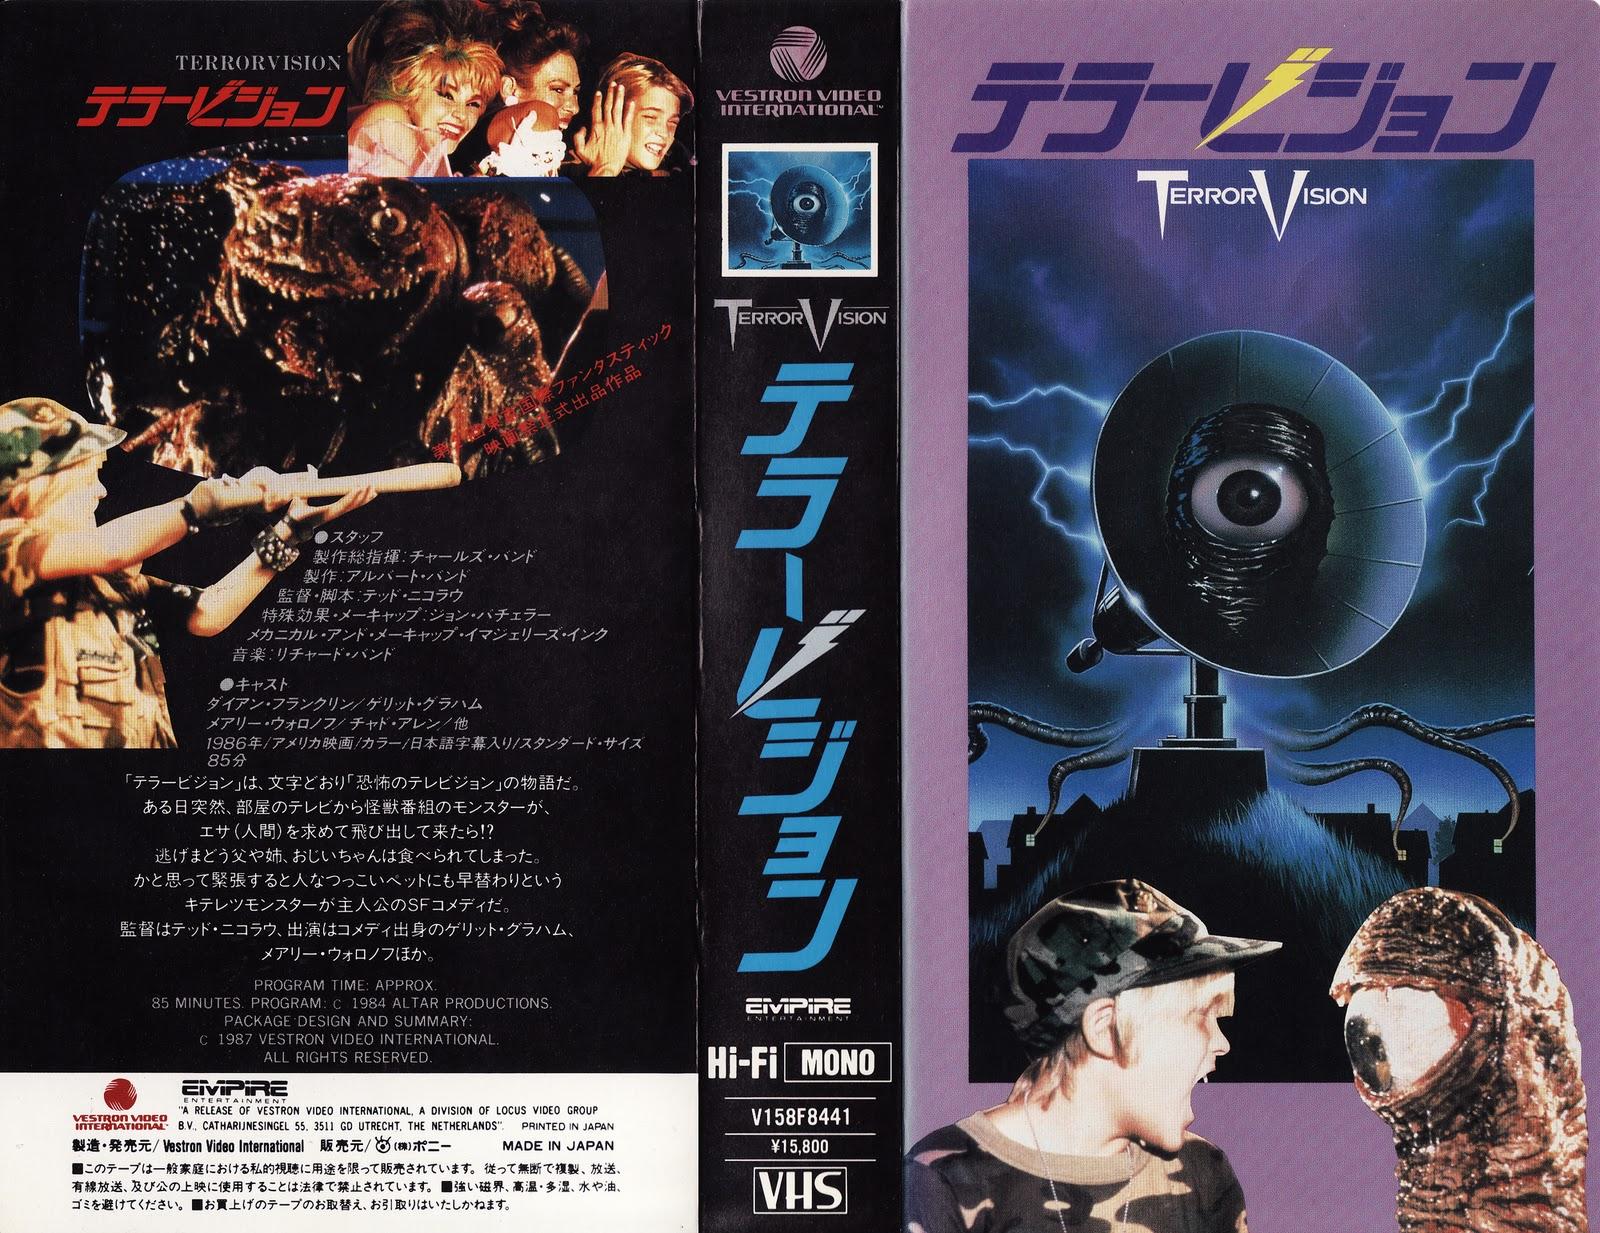 TerrorVision (1986) Japanese VHS Cover